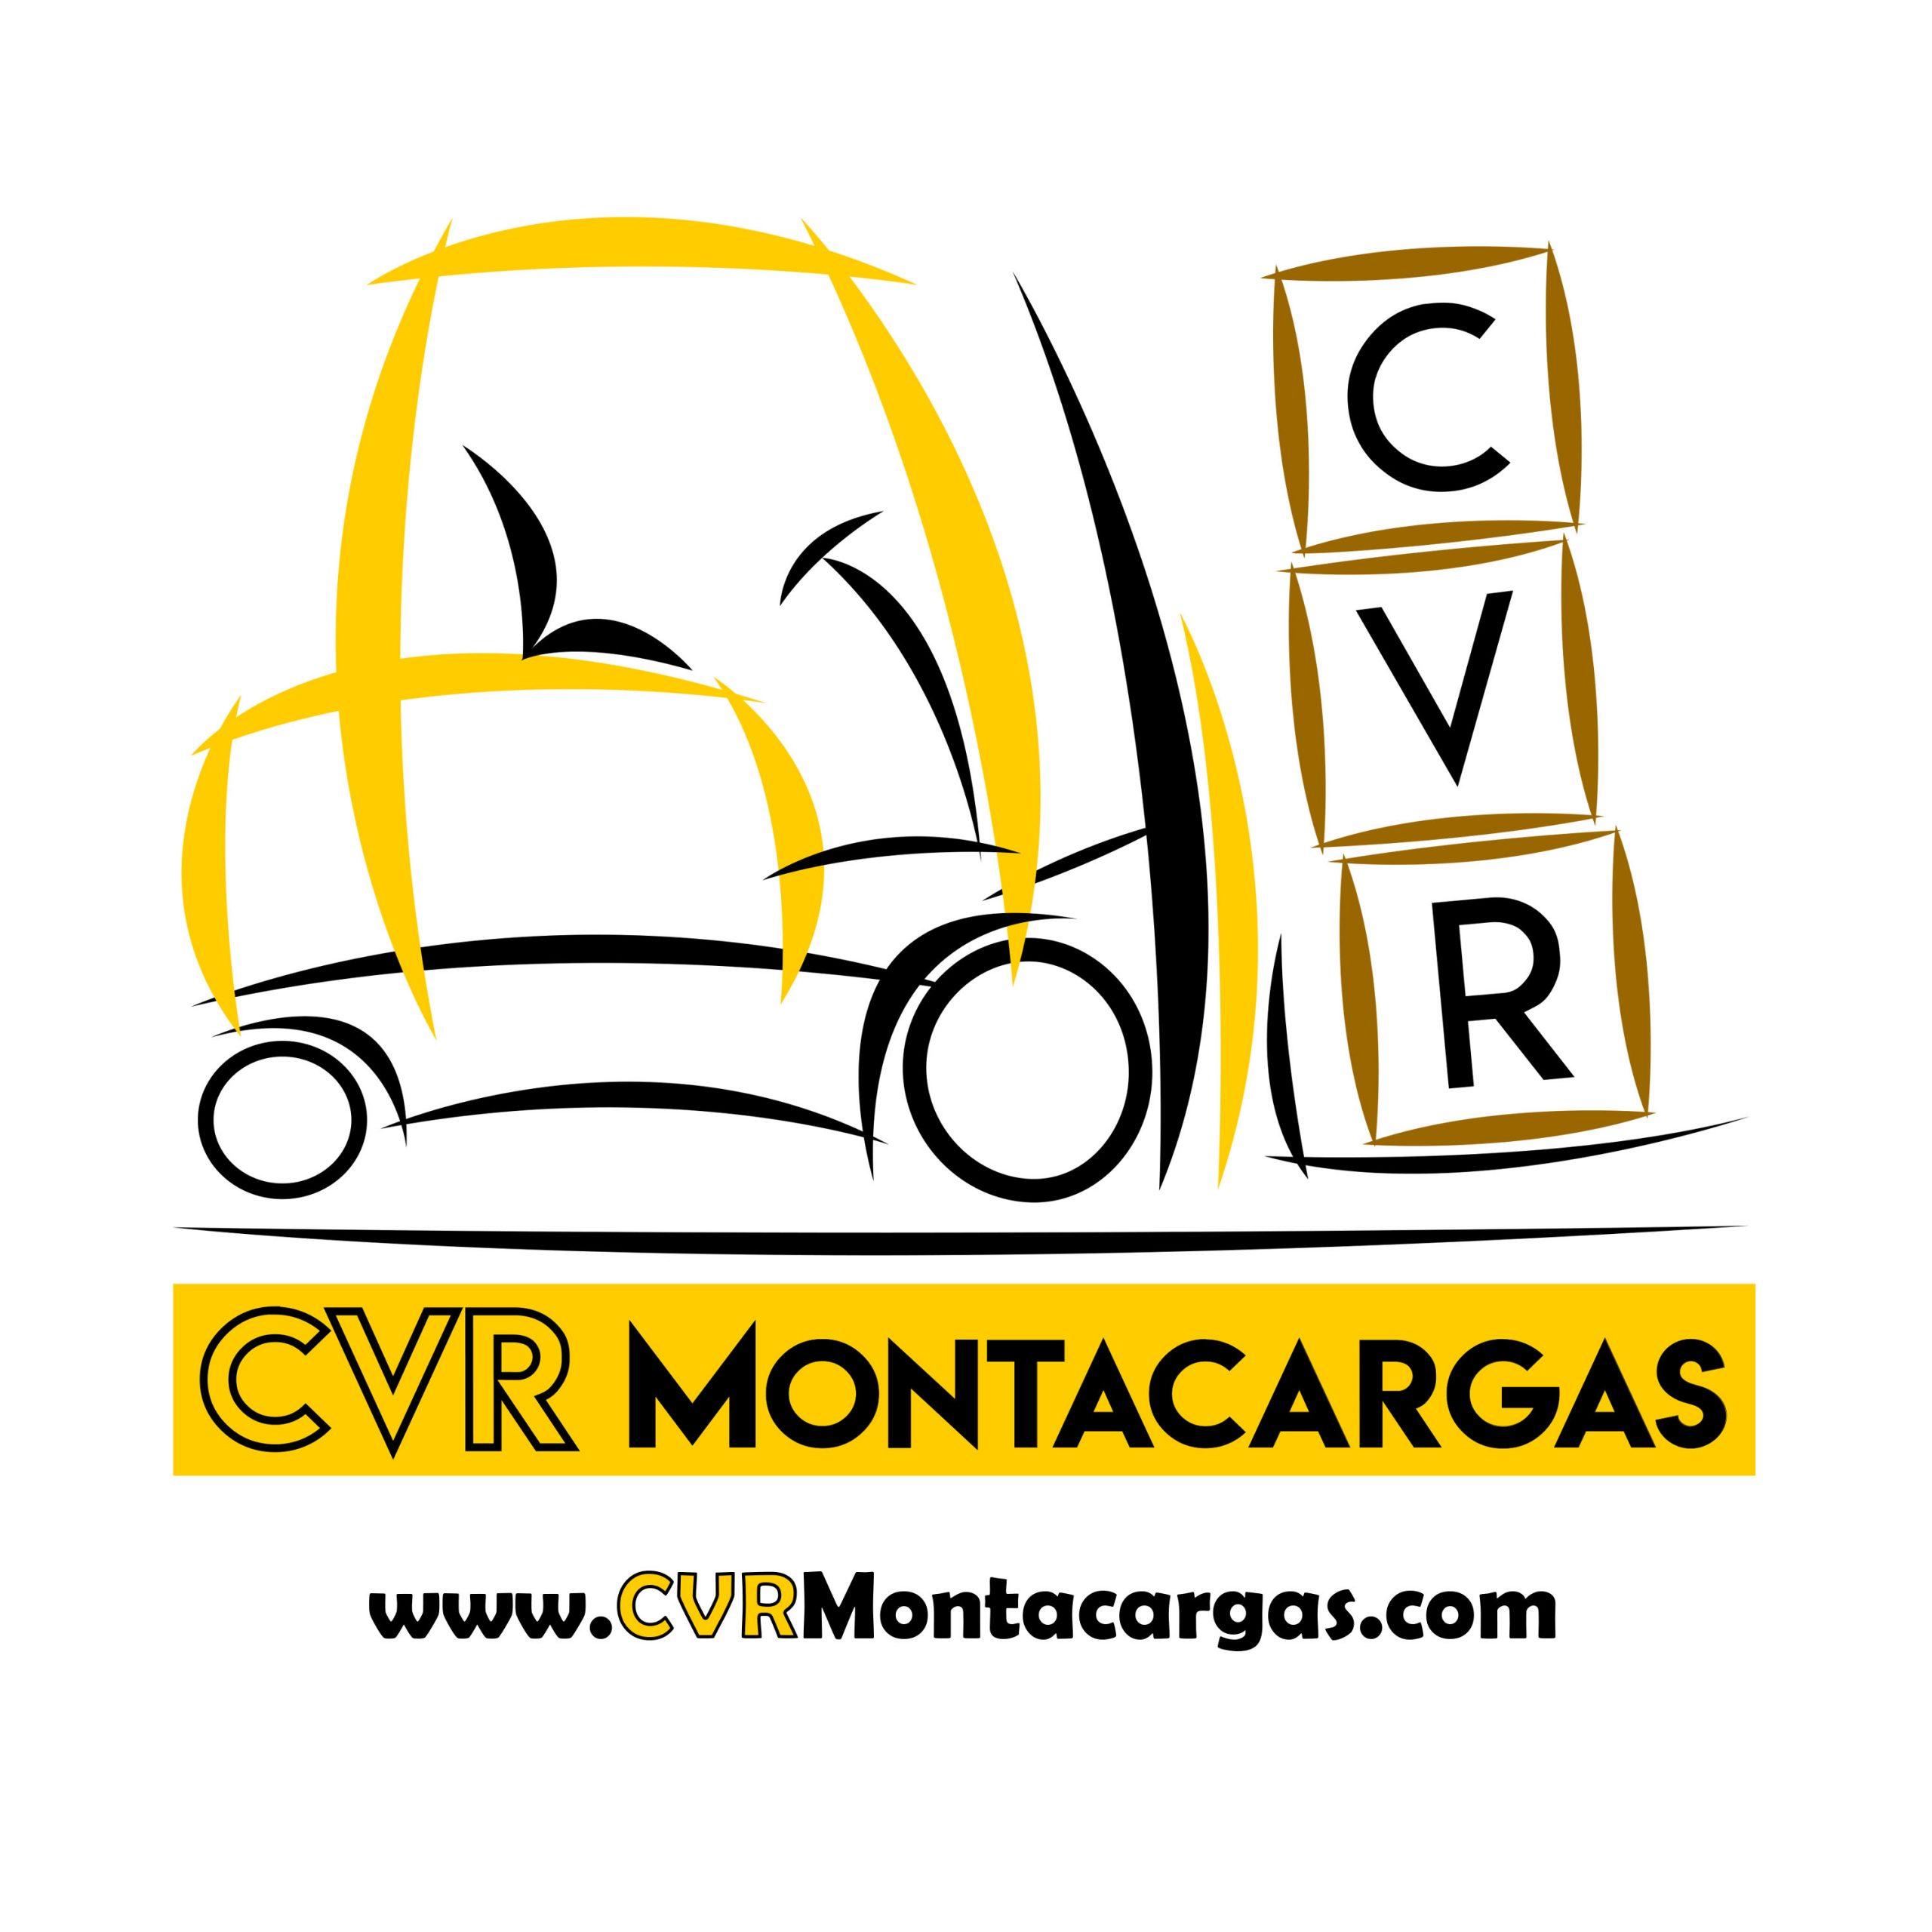 CVR Montacargas